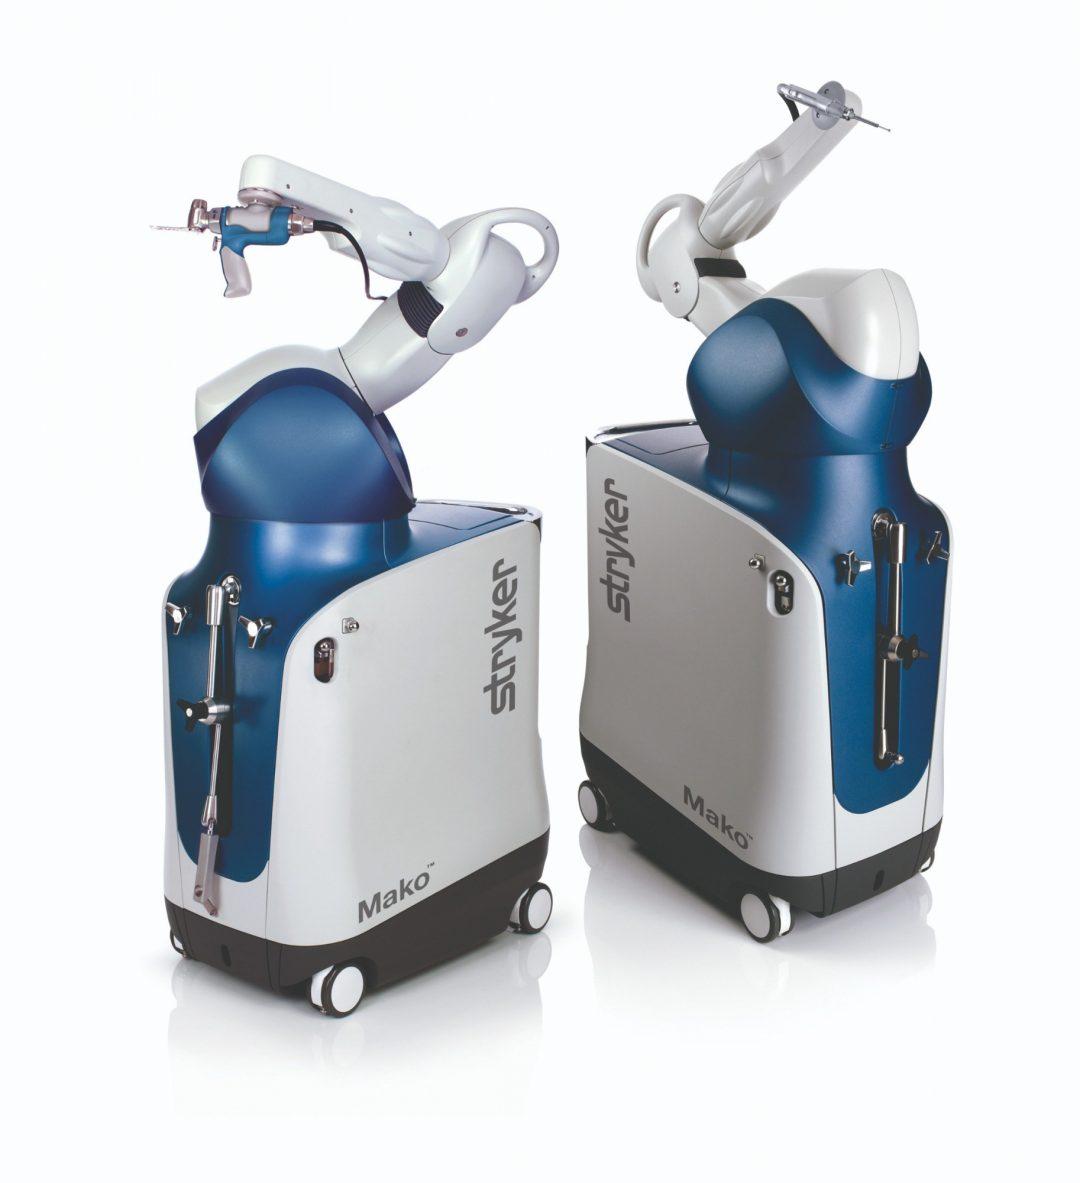 Mako Robot - x2